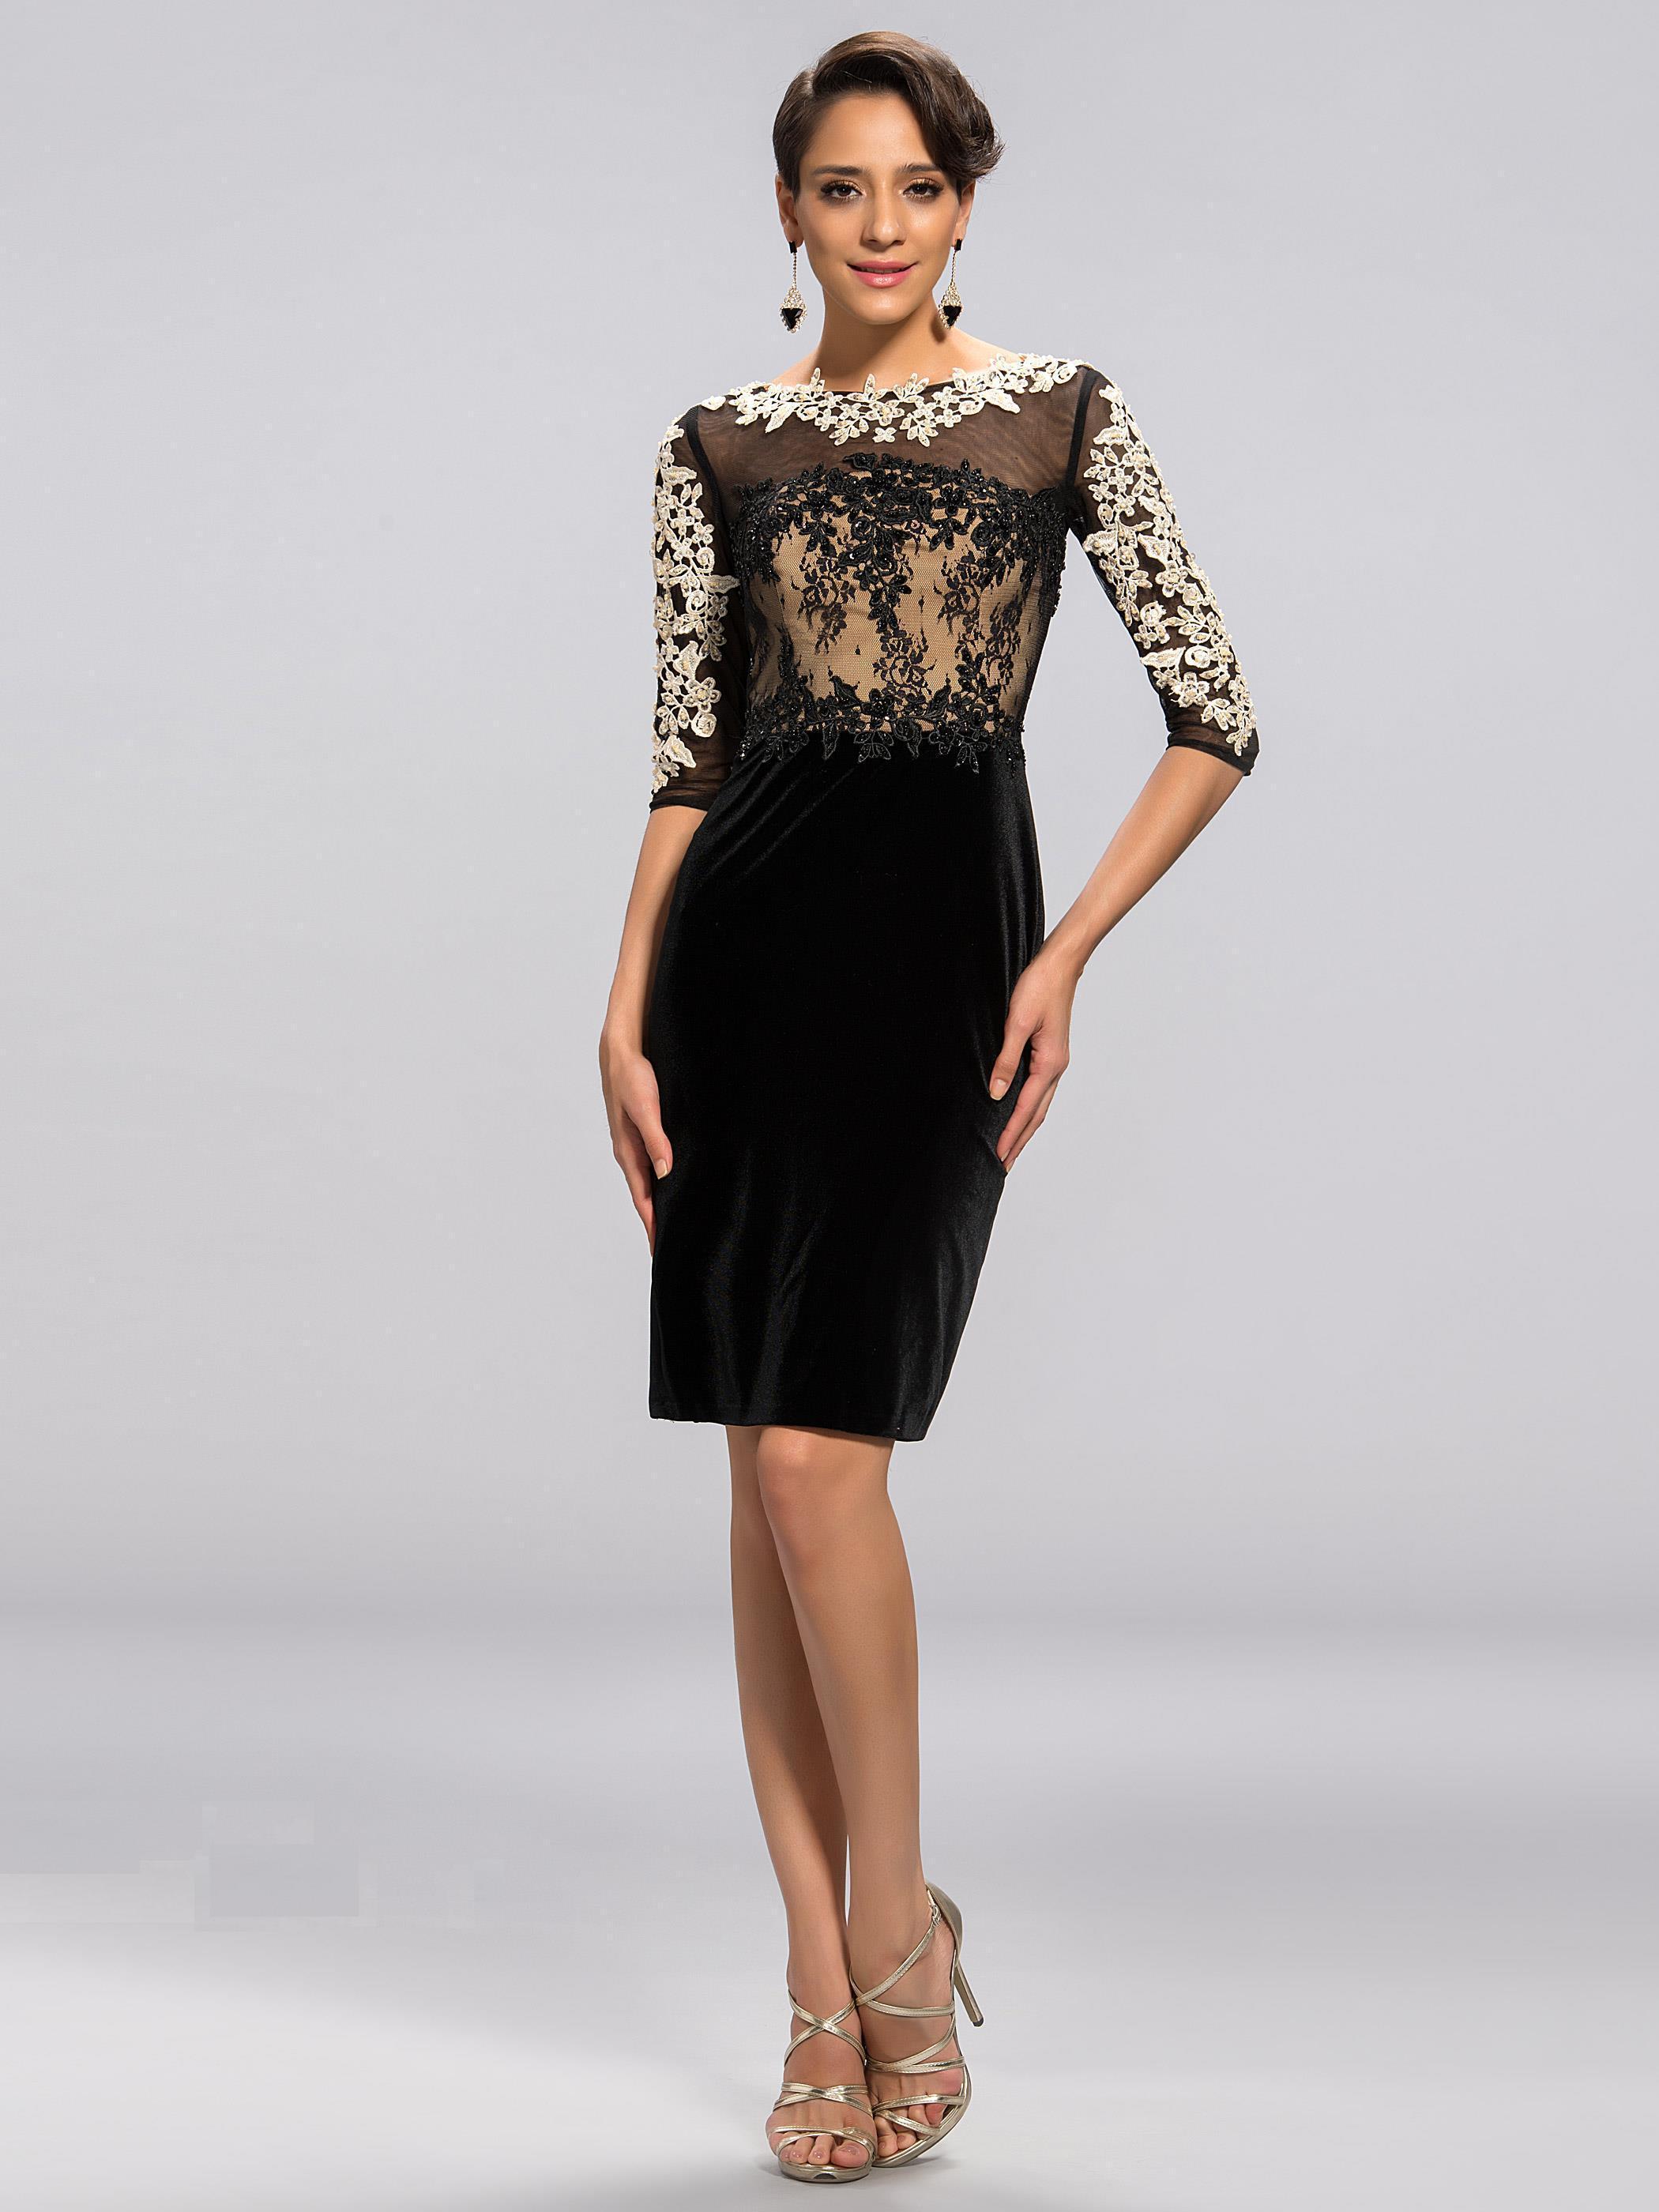 Elegant Formal Dress Scoop Little Black Dress Wedding